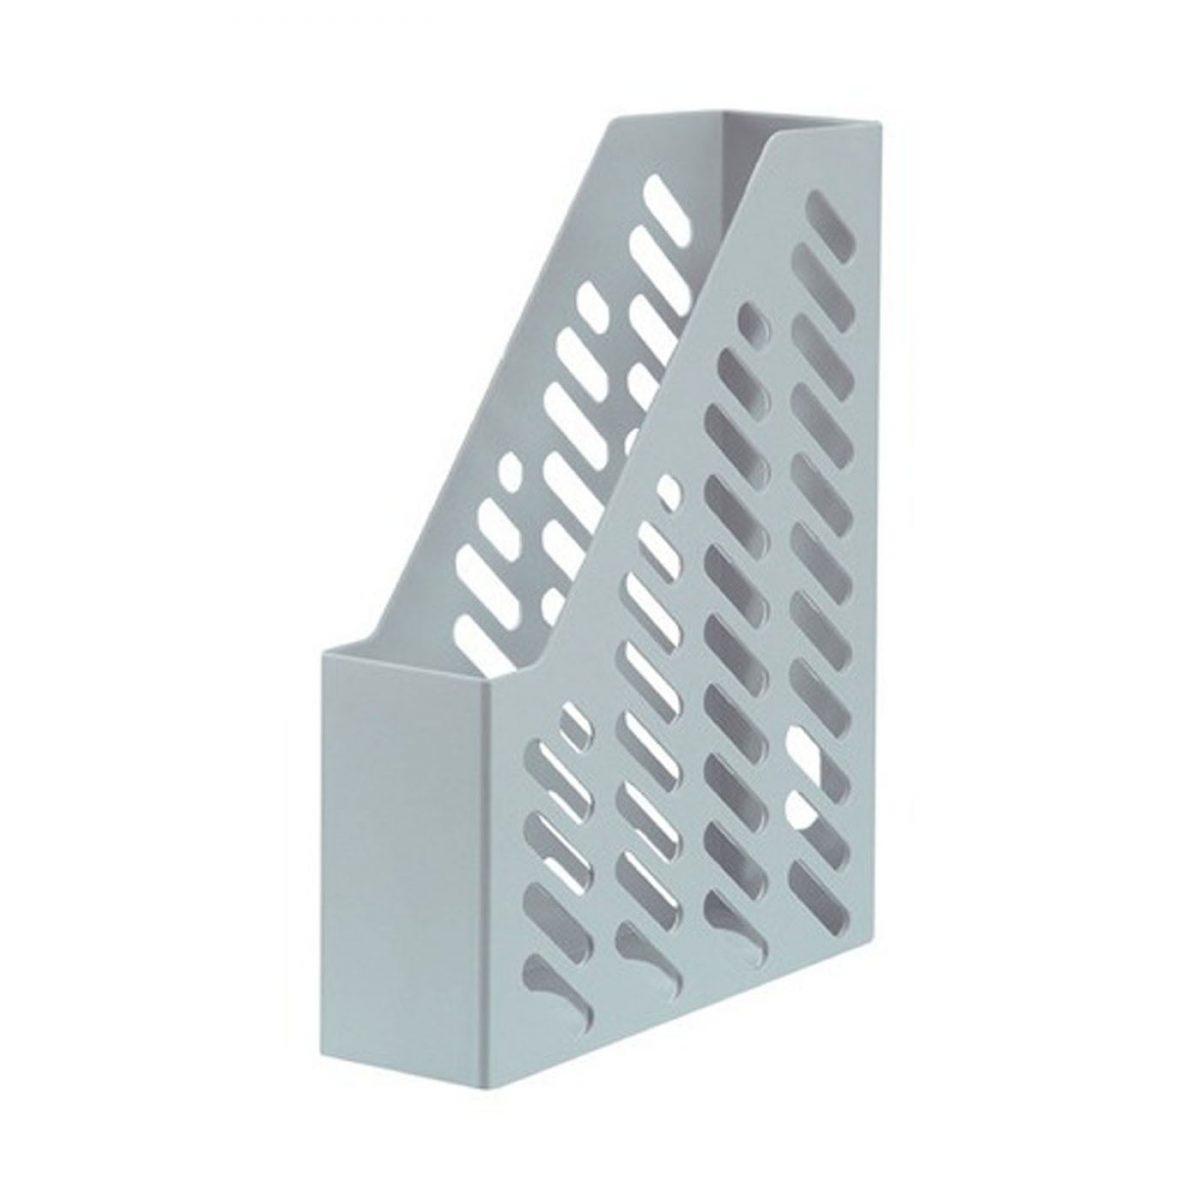 Suport vertical plastic pentru cataloage HAN Klassik - gri deschis